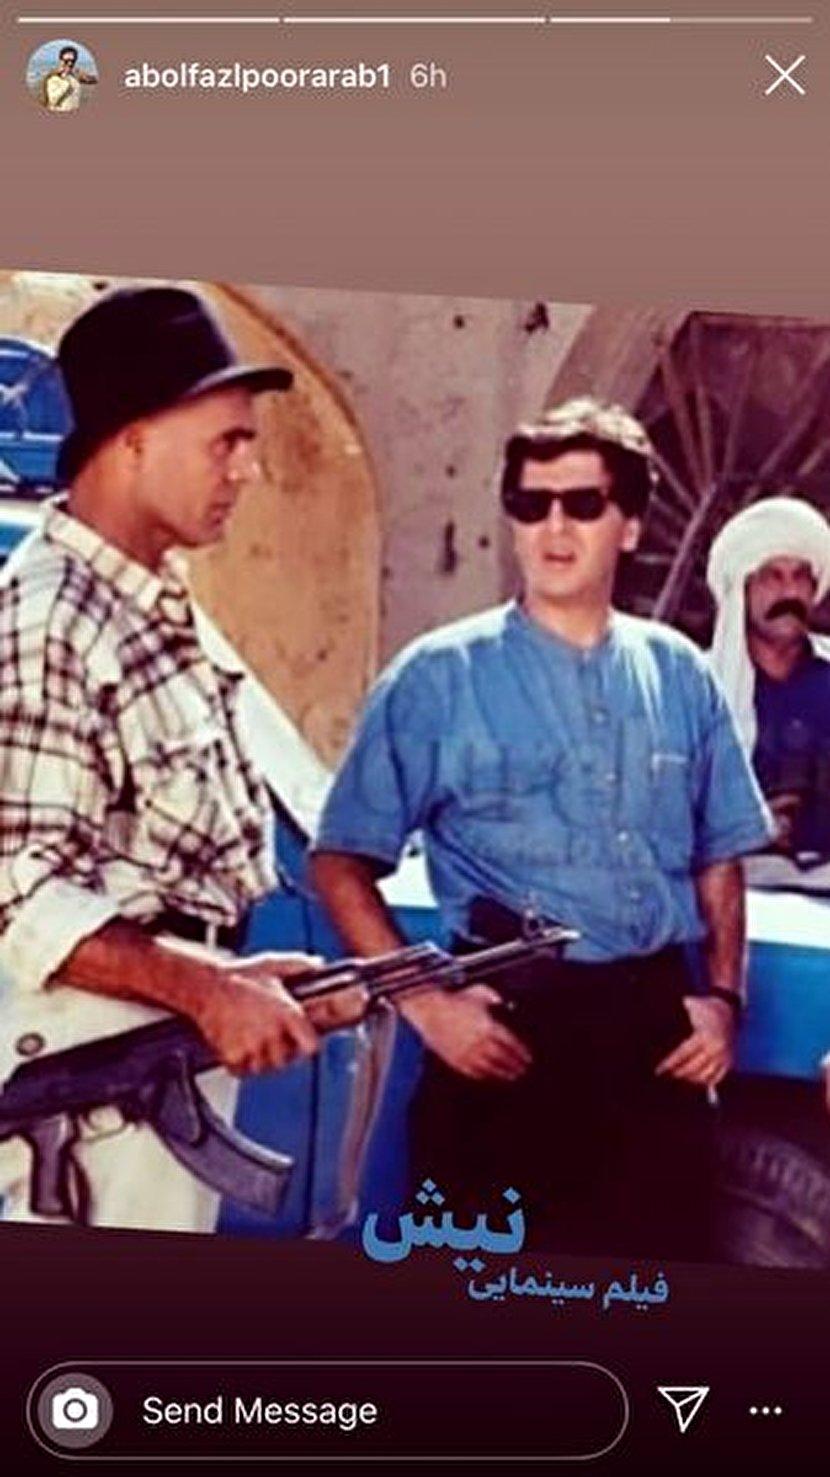 عکس قدیمی ابوالفضل پورعرب از یک فیلم اکشن+عکس